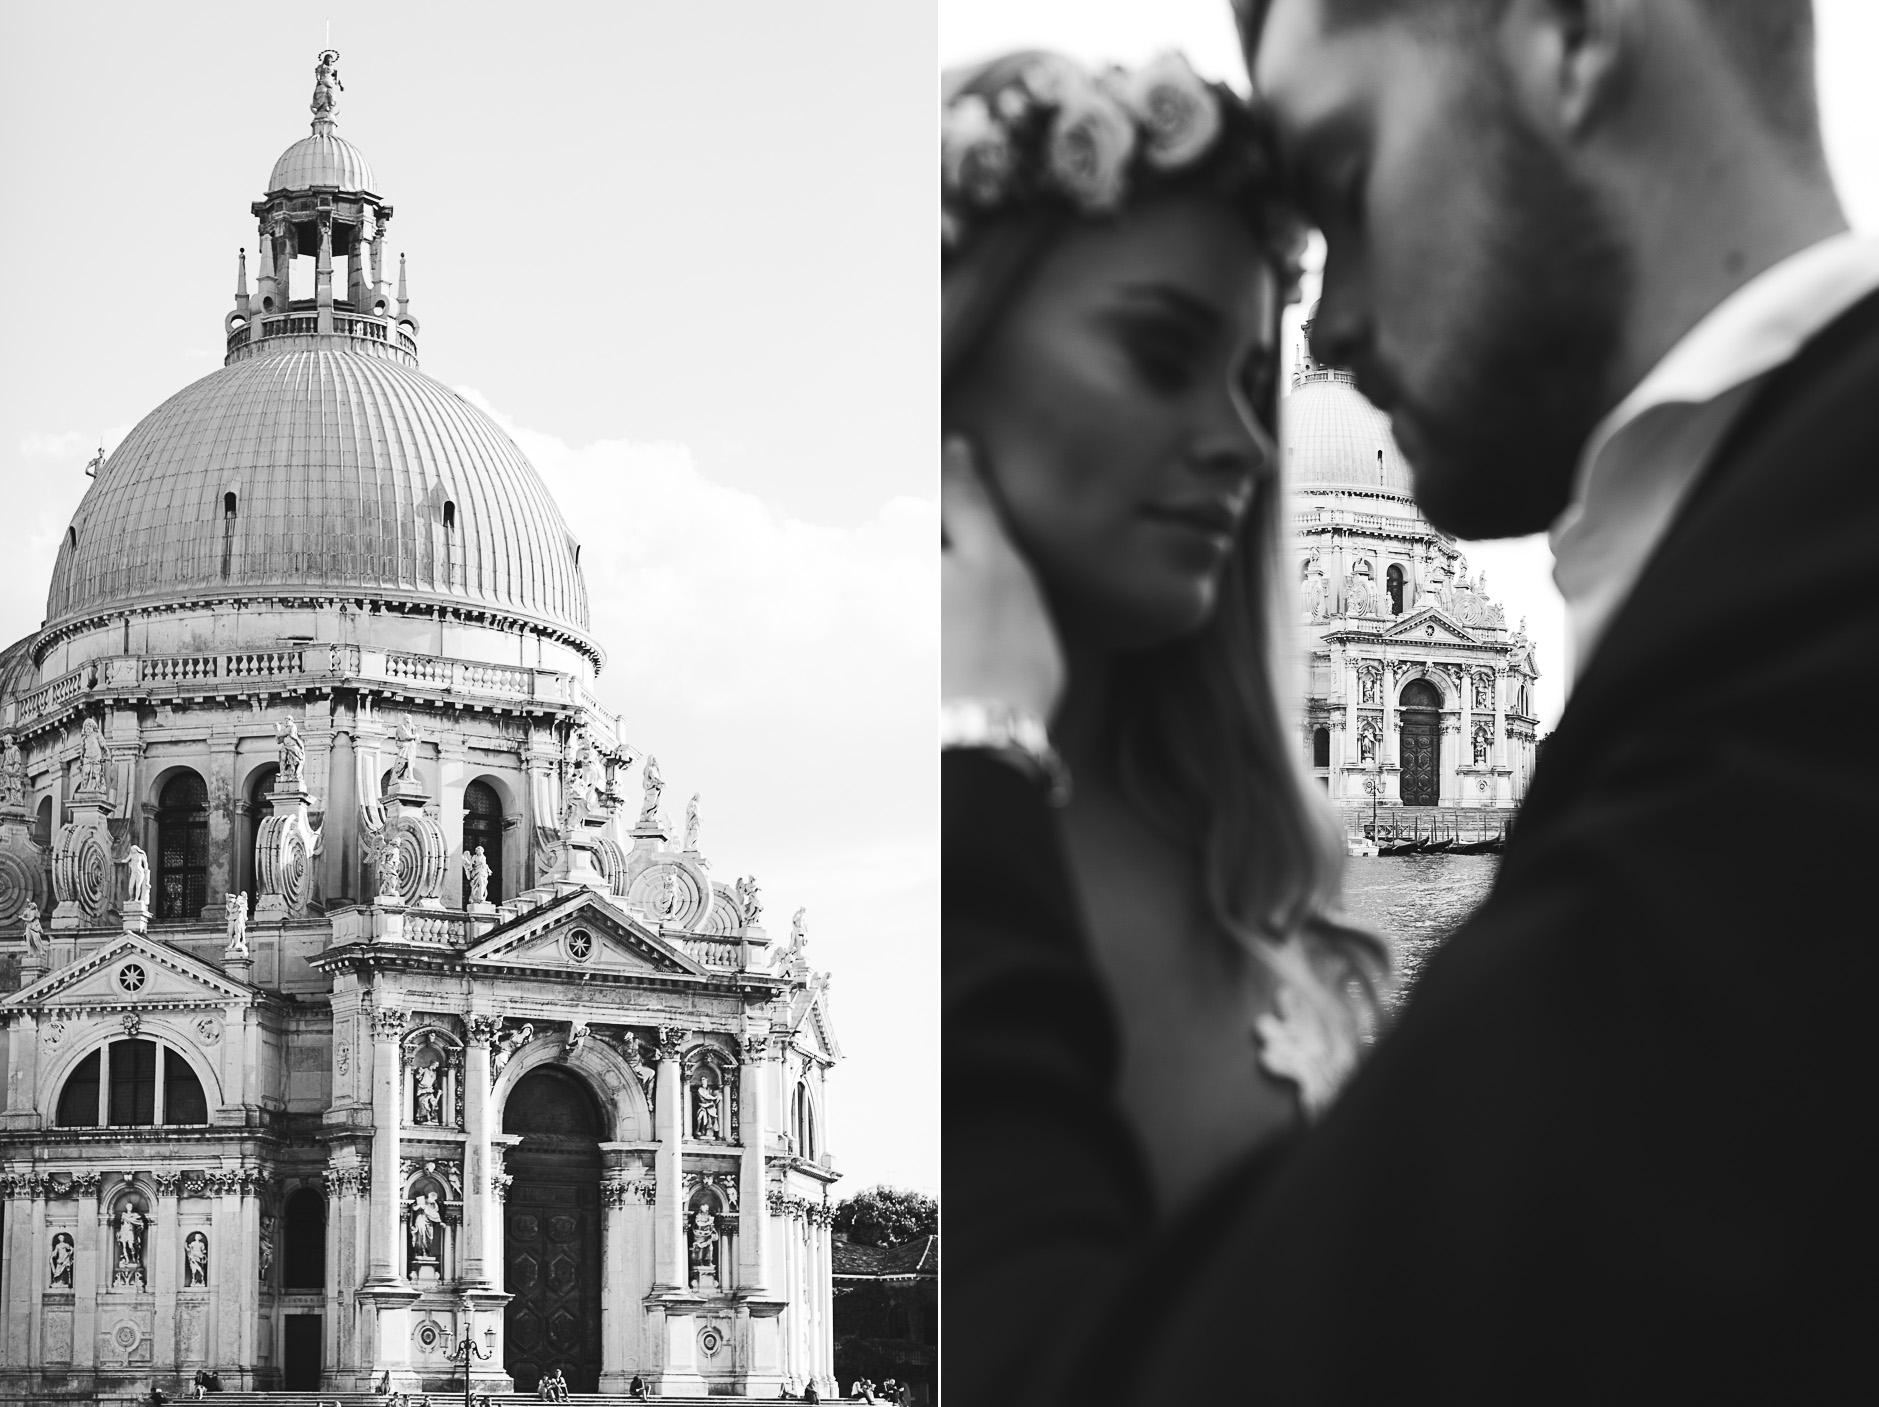 Hochzeitsfotograf Le Hai Linh Boho Chic After Wedding Shooting Venedig Timo Horn 1.FC Koeln 030.jpg